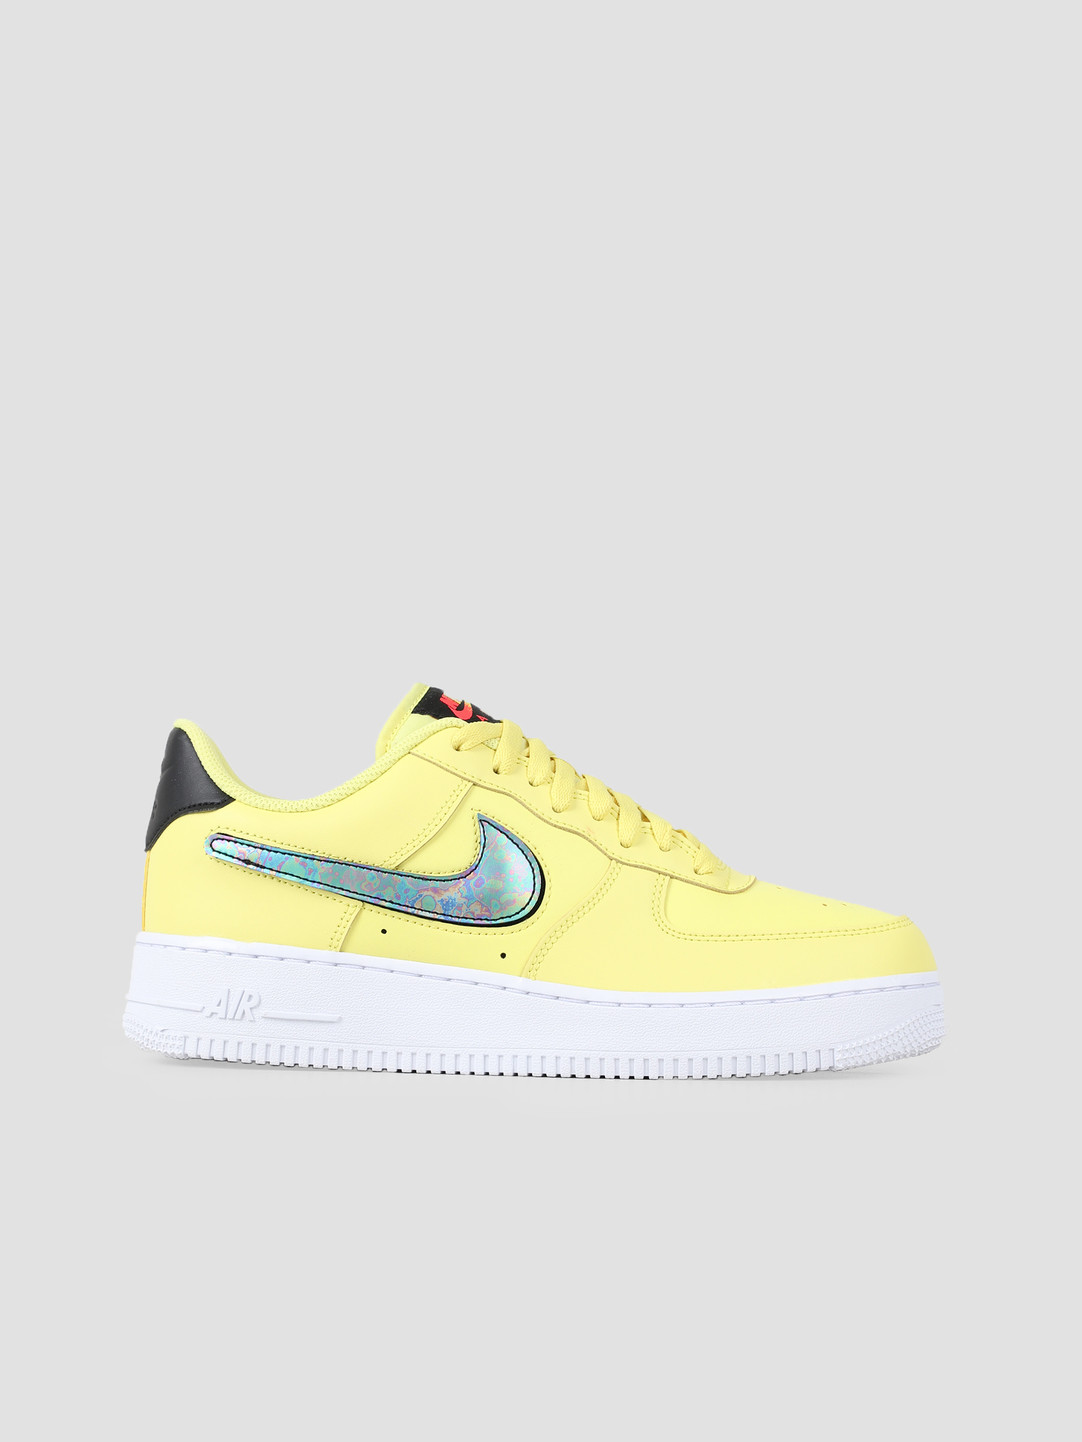 tout neuf 8f1eb 2e53b Nike Air Force 1 07 Lv8 3 Yellow Pulse Black White White CI0064-700